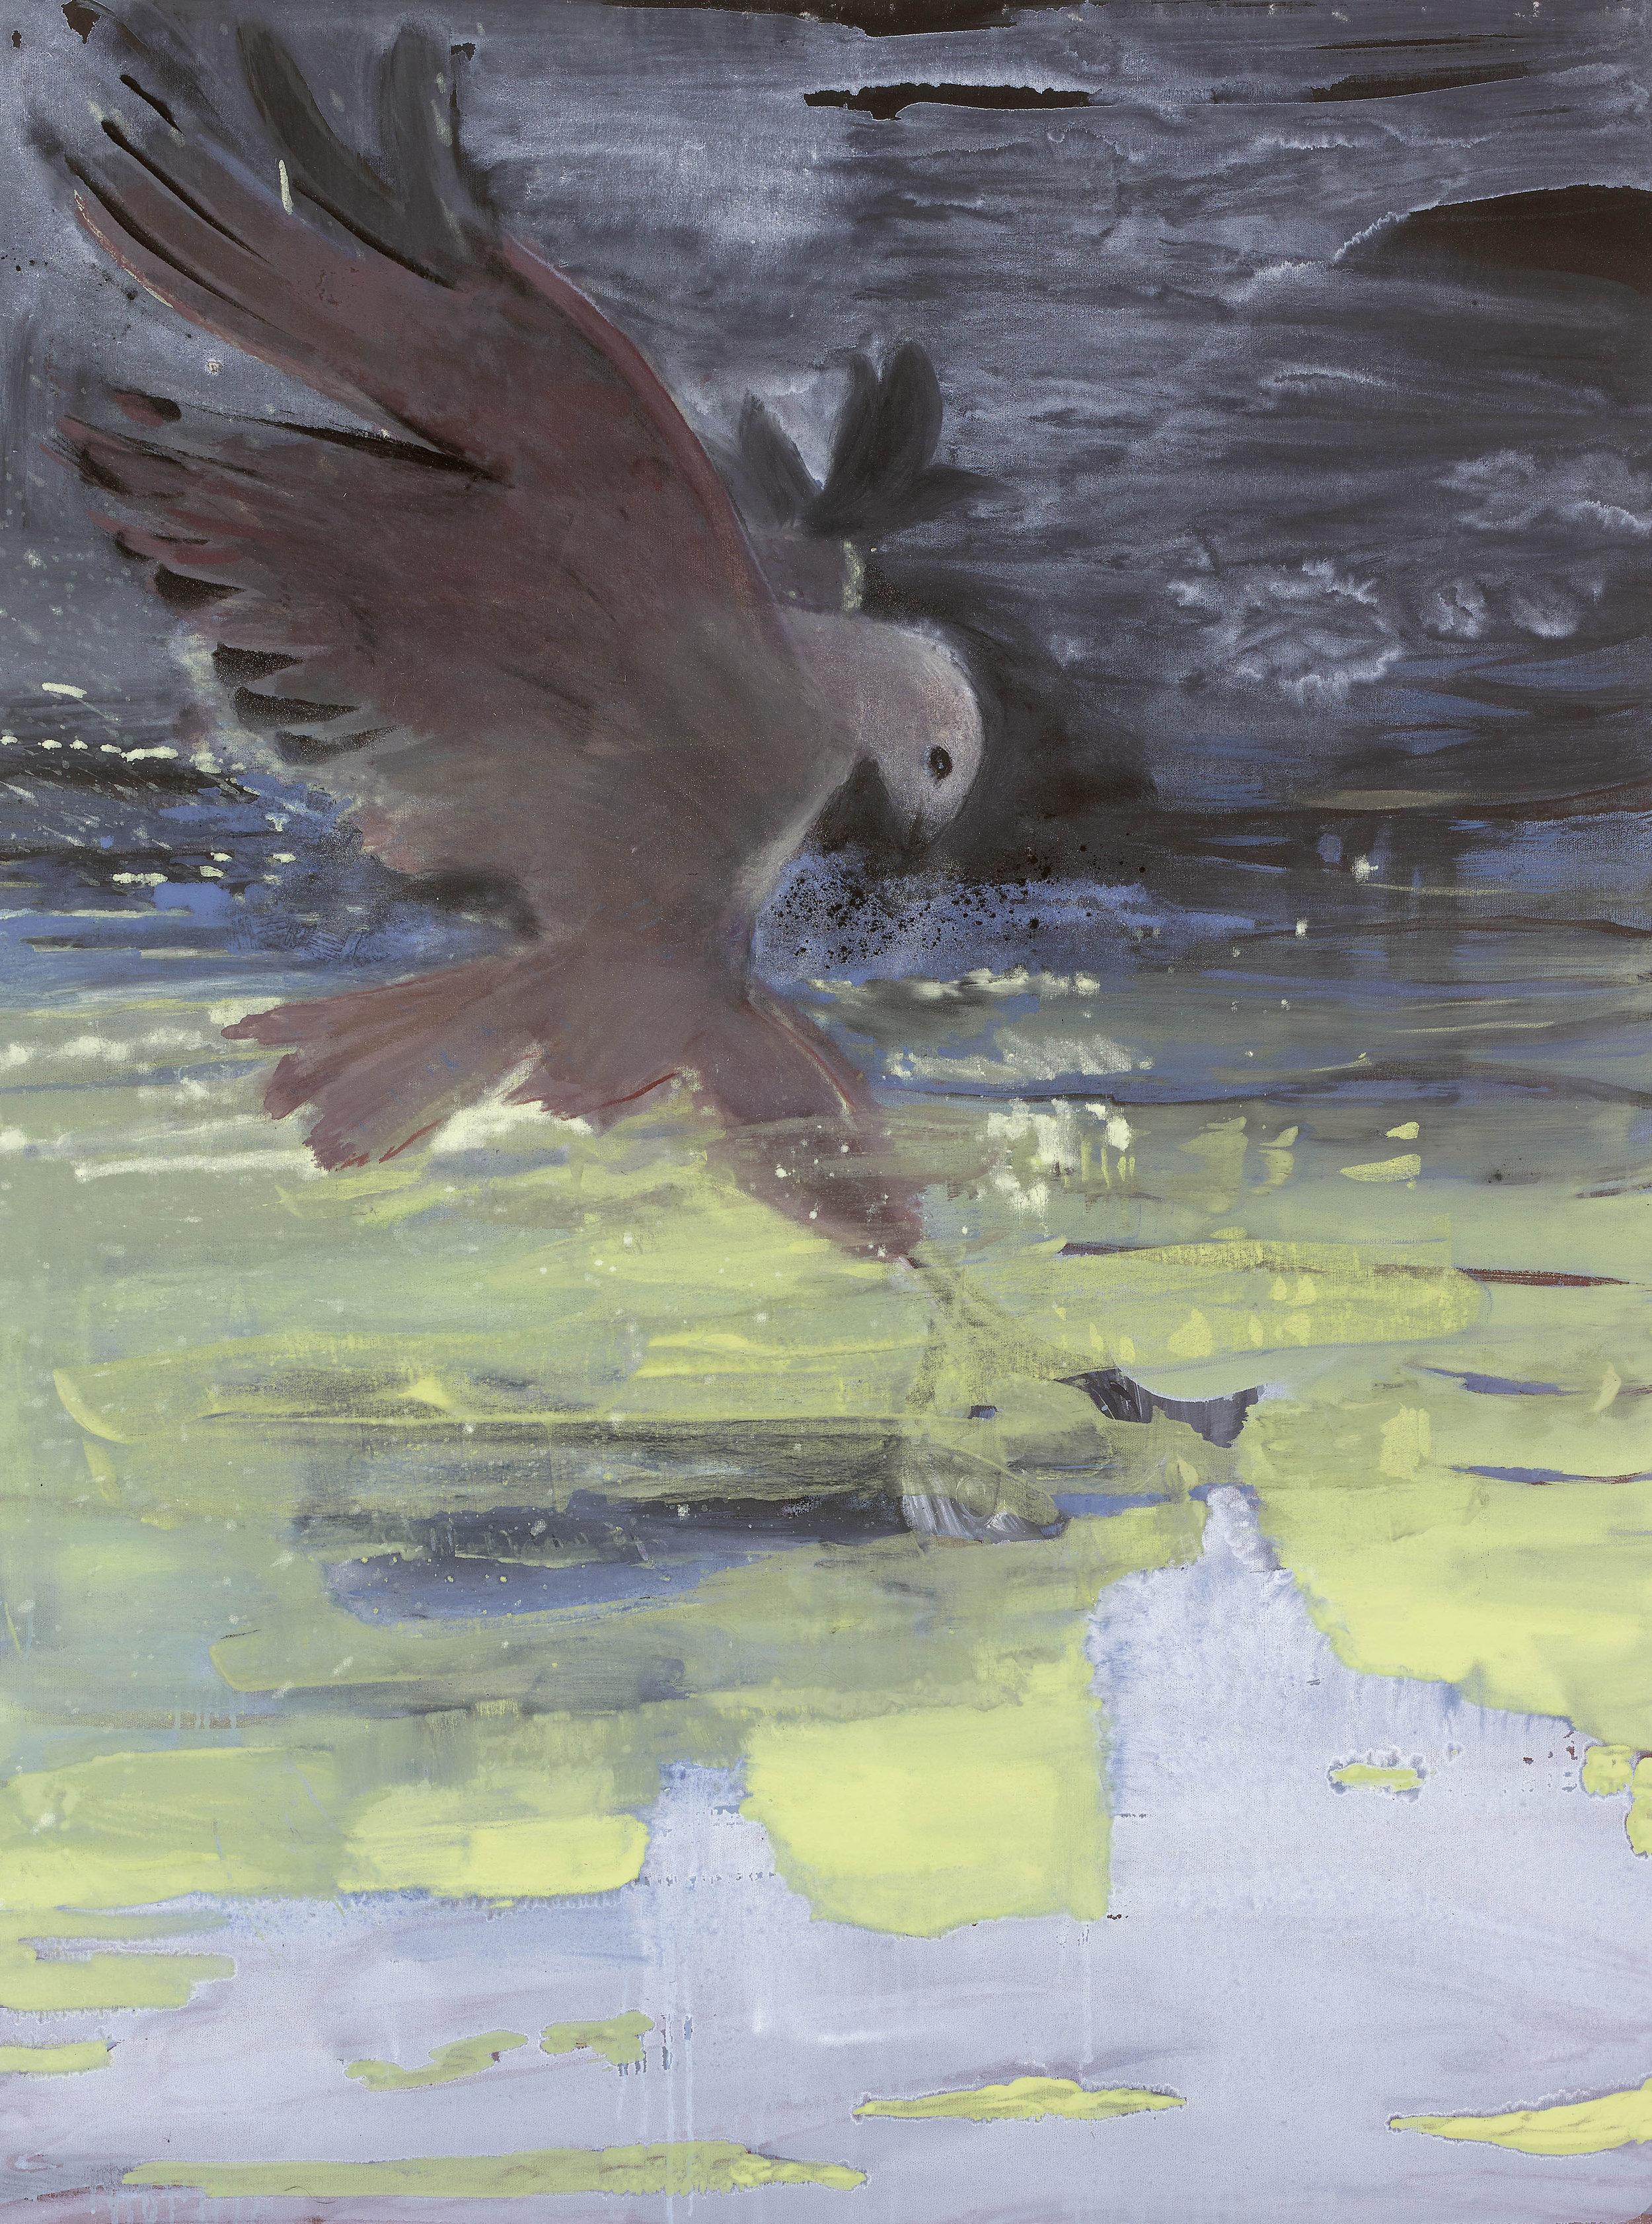 'The Prey' oil & pigment on linen 121 x 90 cms